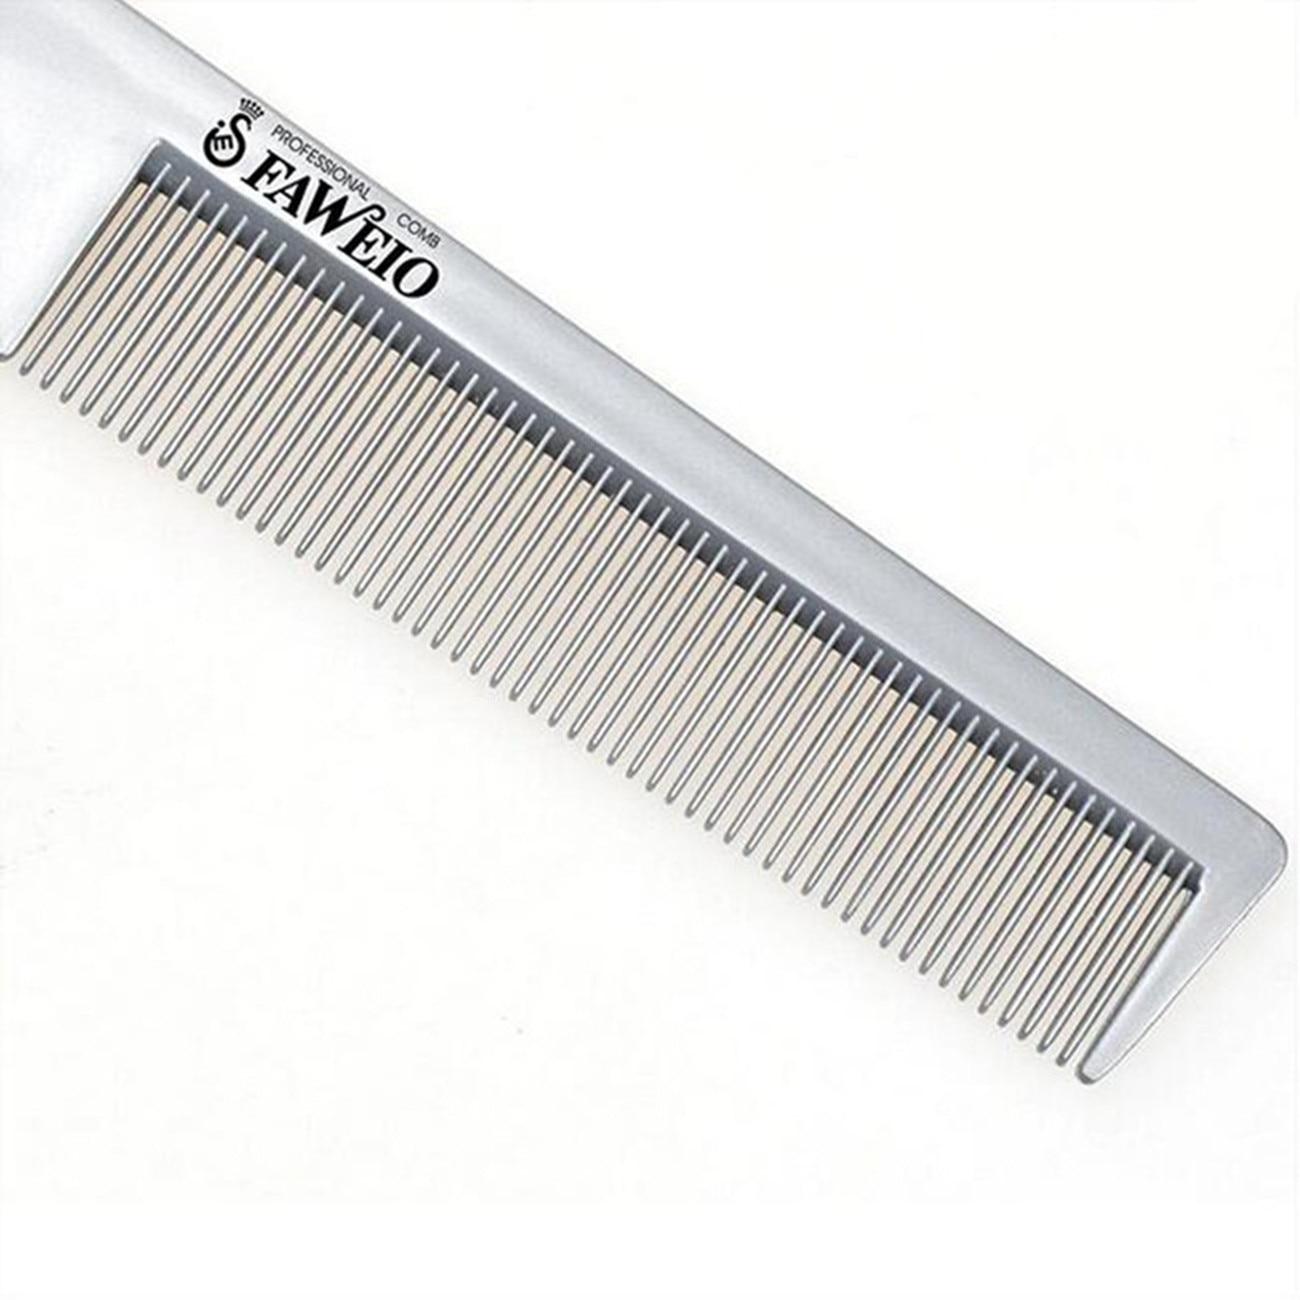 1 Pc Quality Professional Hair Razor Comb Hair Razor Cutting ...